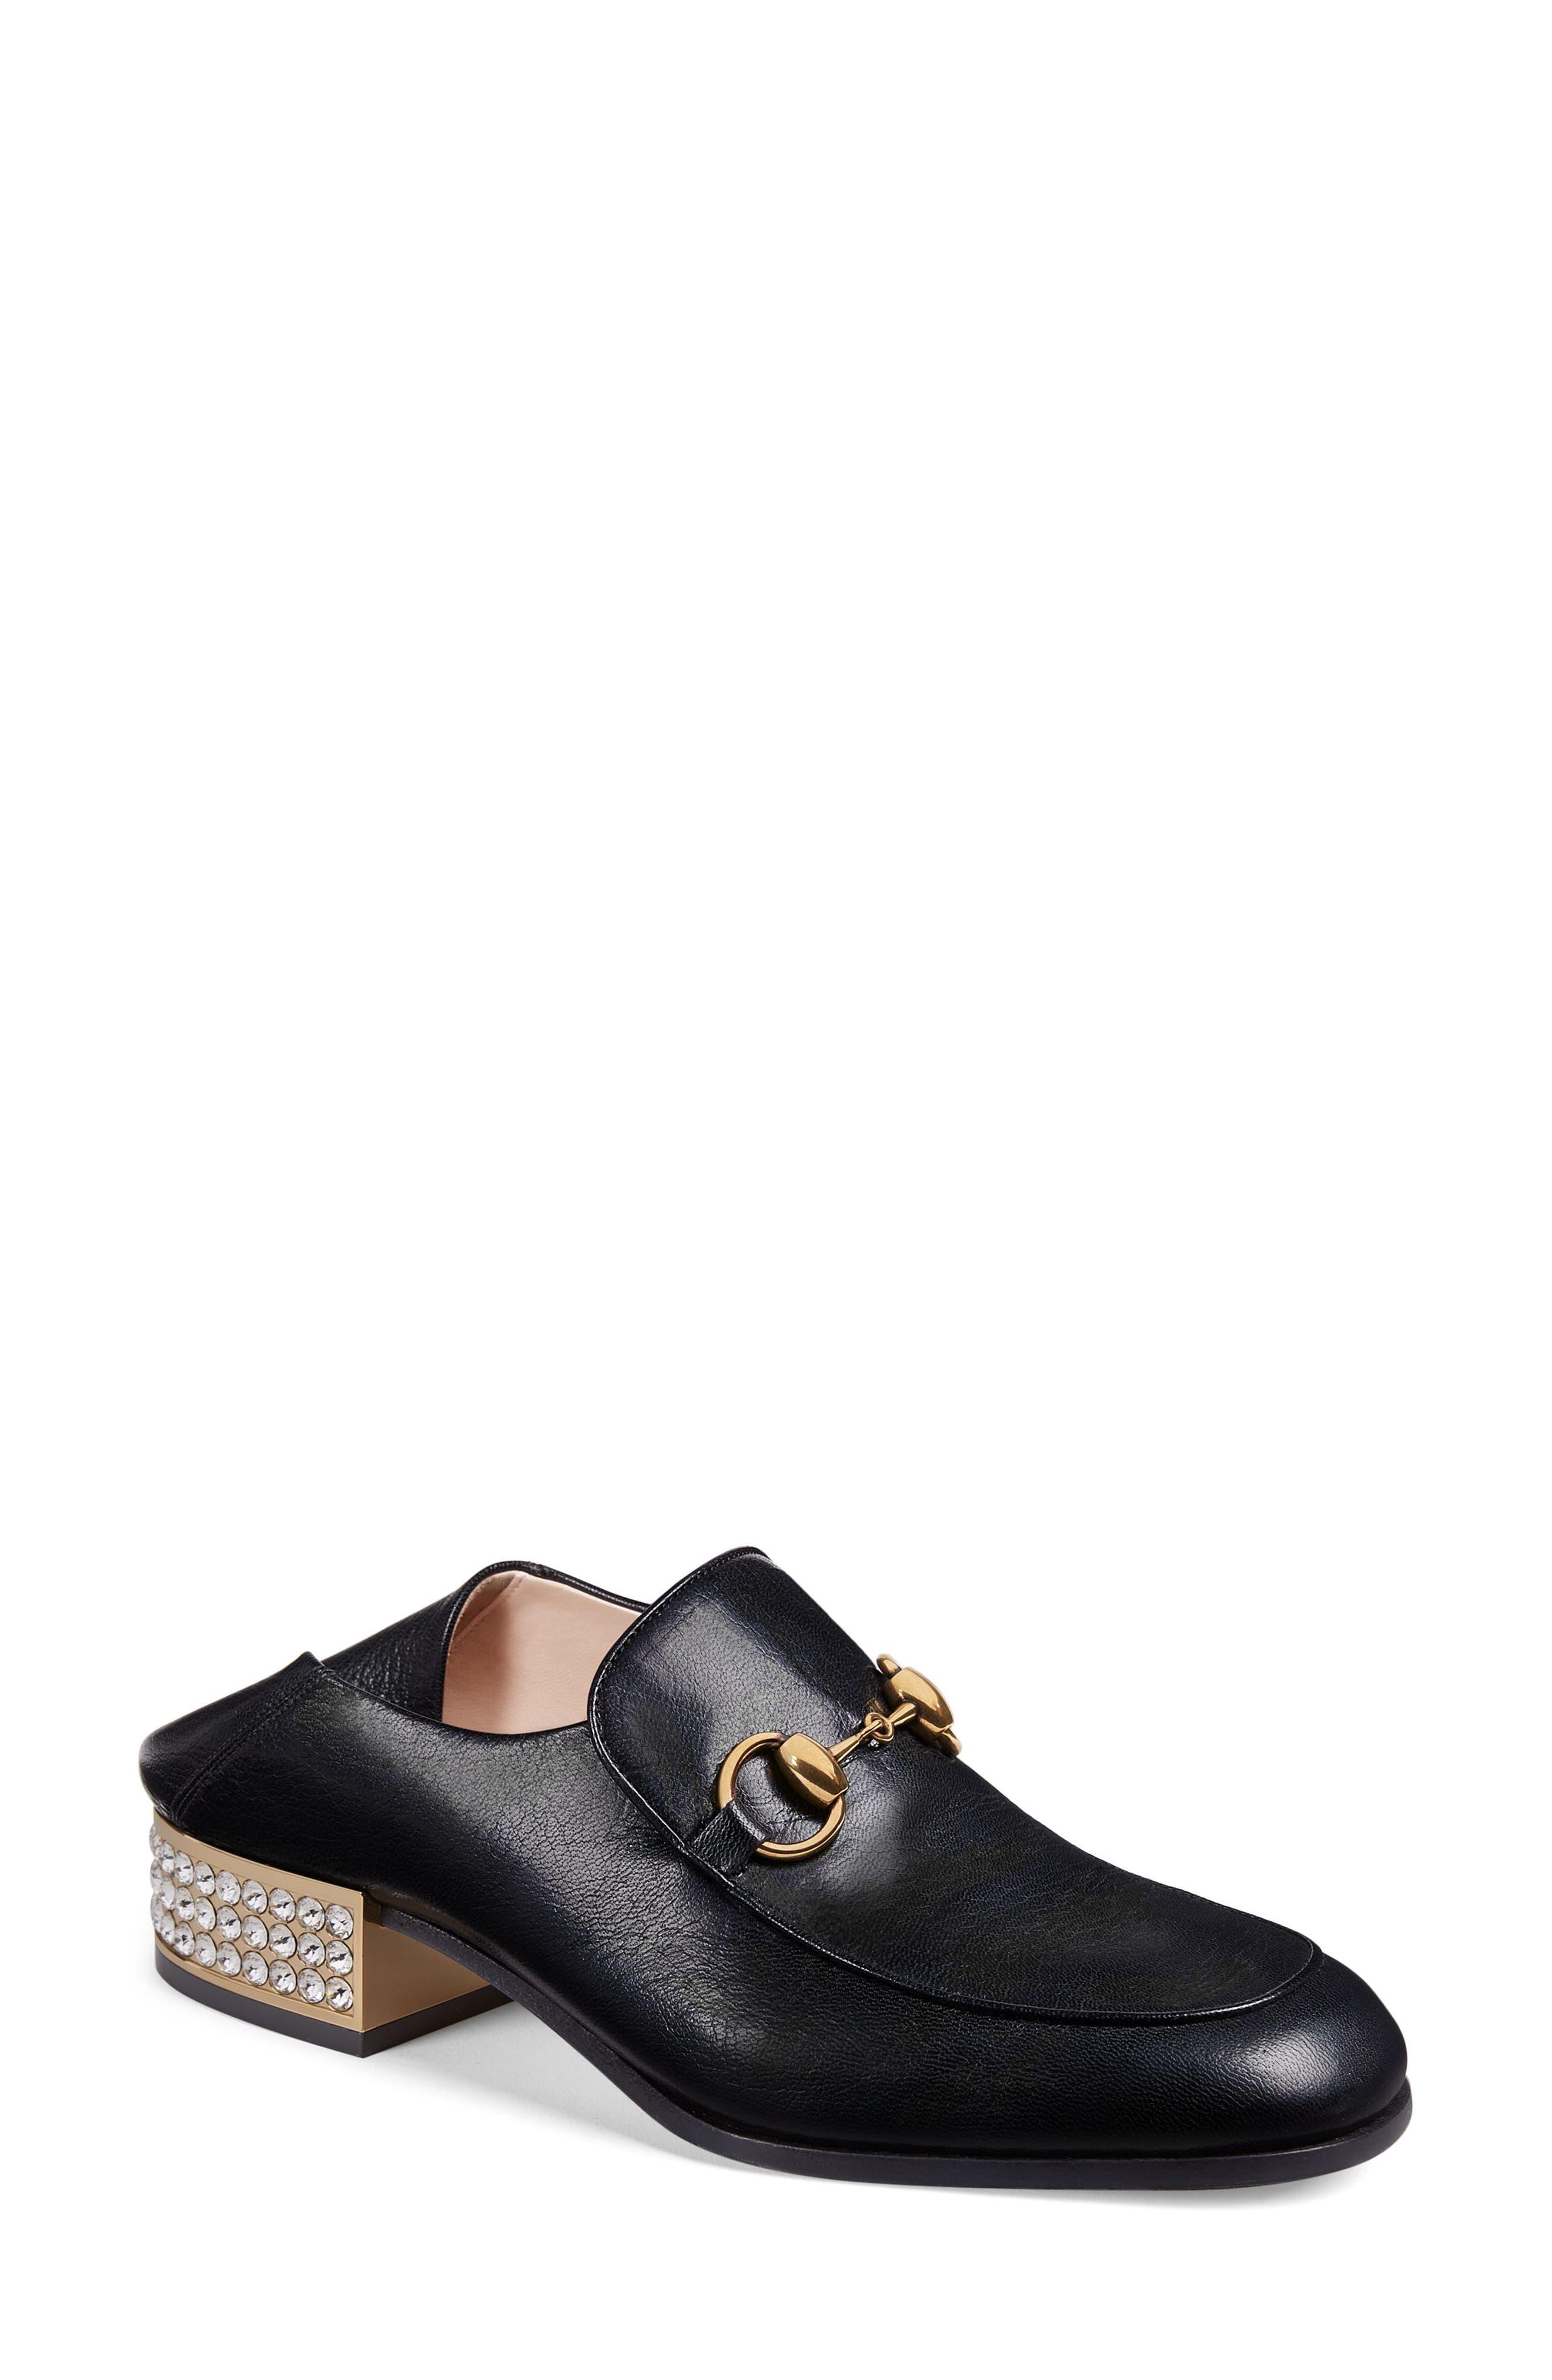 Mister Crystal Convertible Loafer,                         Main,                         color, BLACK